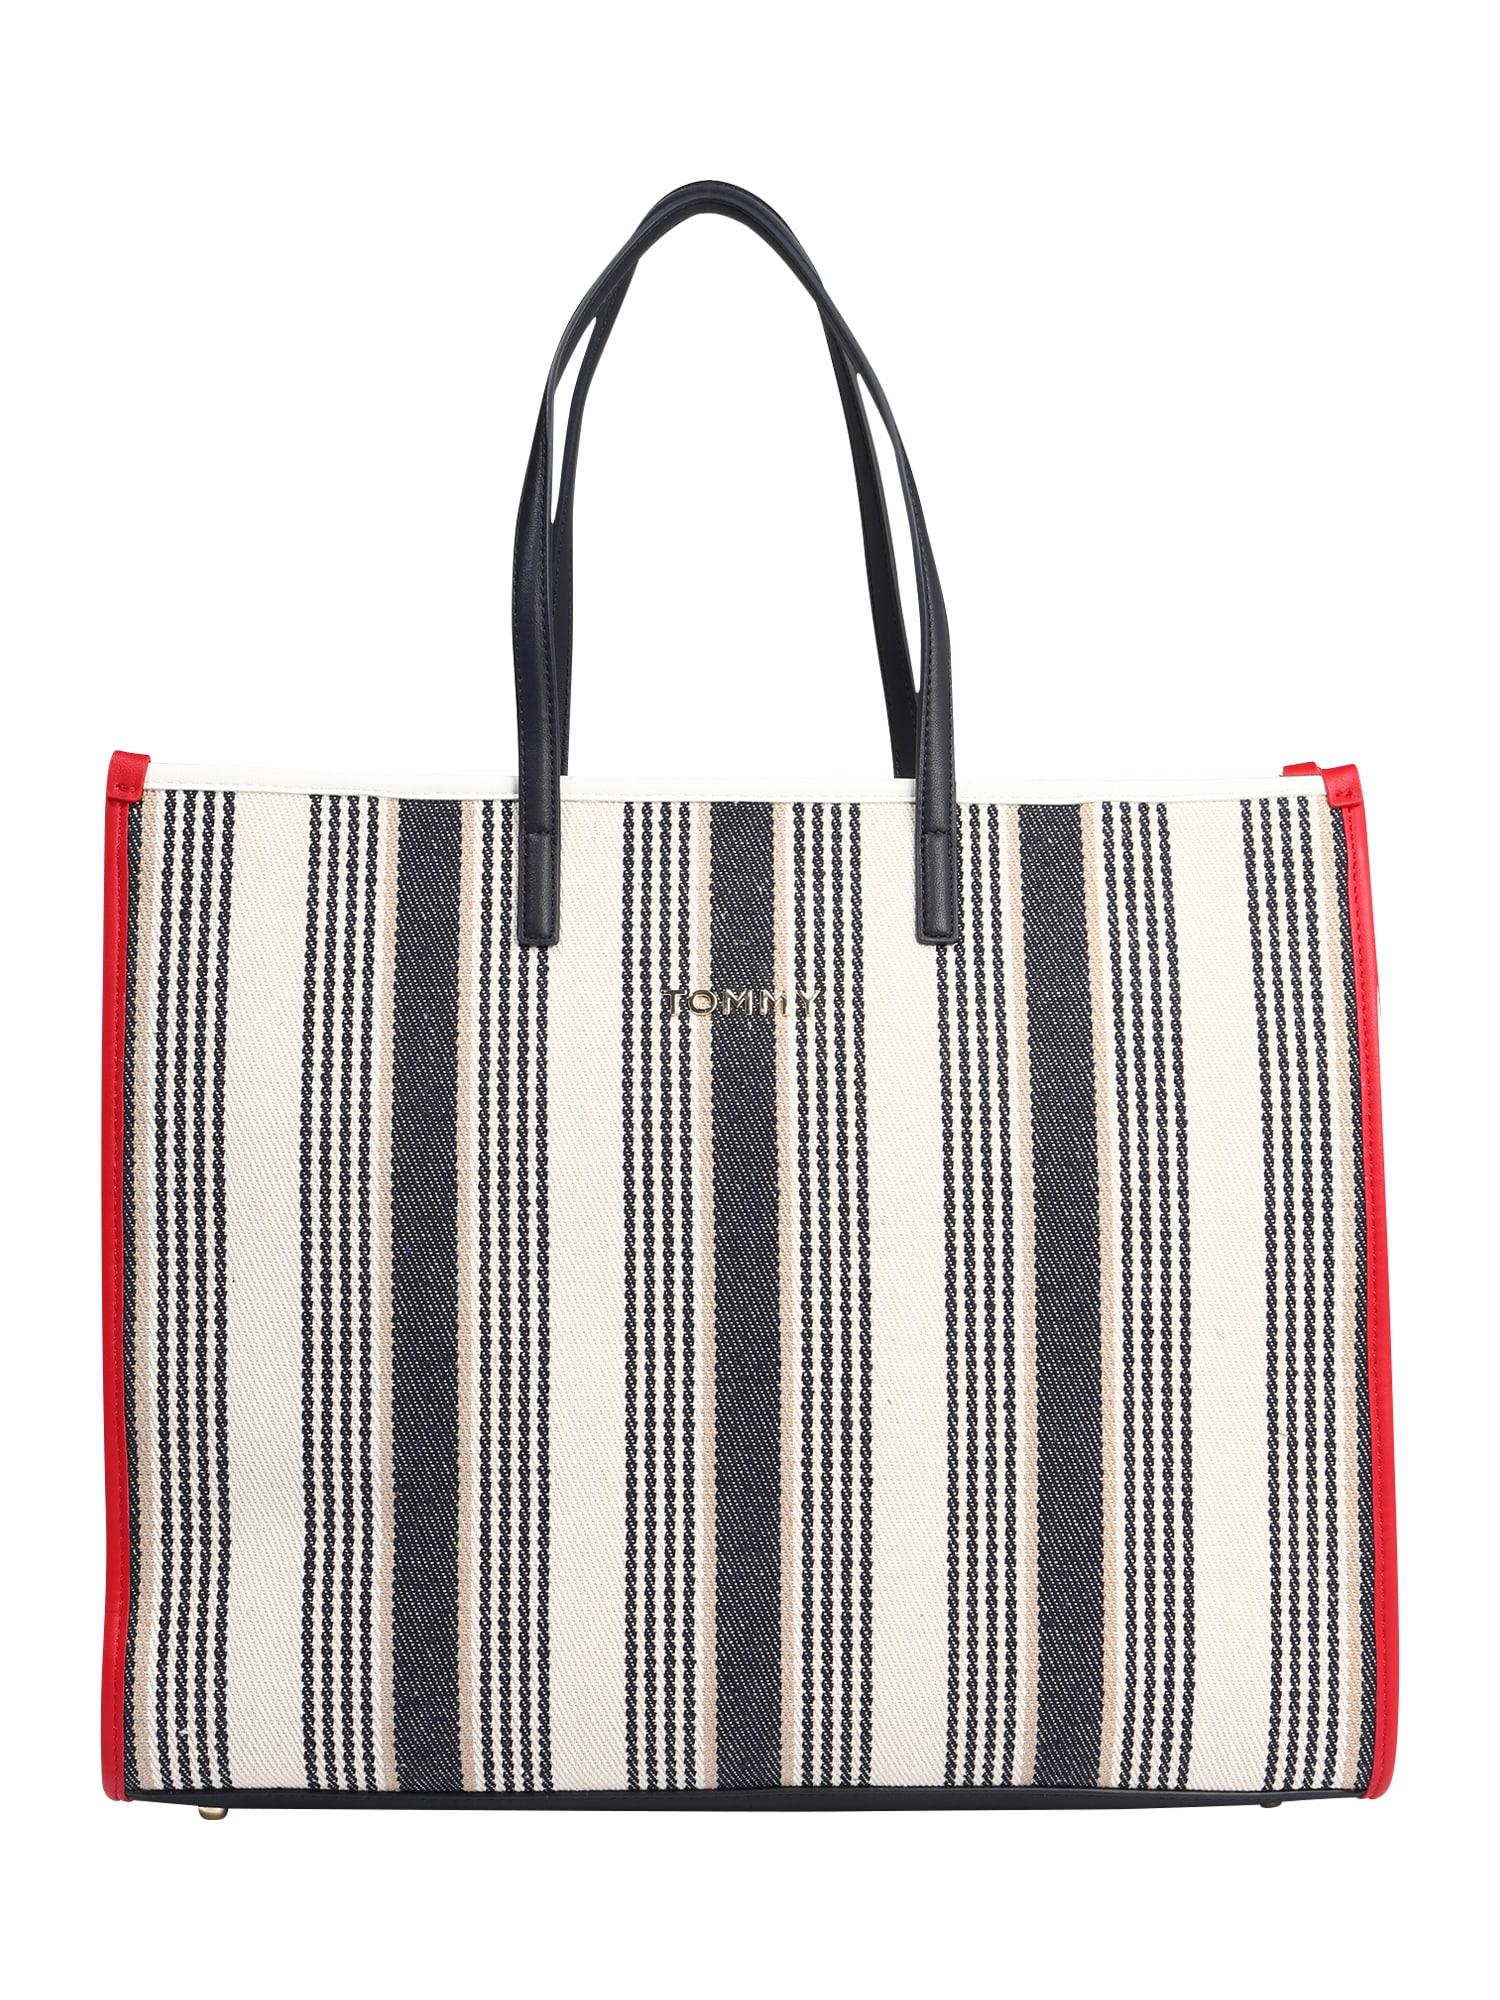 TOMMY HILFIGER Paplūdimio krepšys 'TOMMY BEACH BAG STRIPE' juoda / balta / raudona